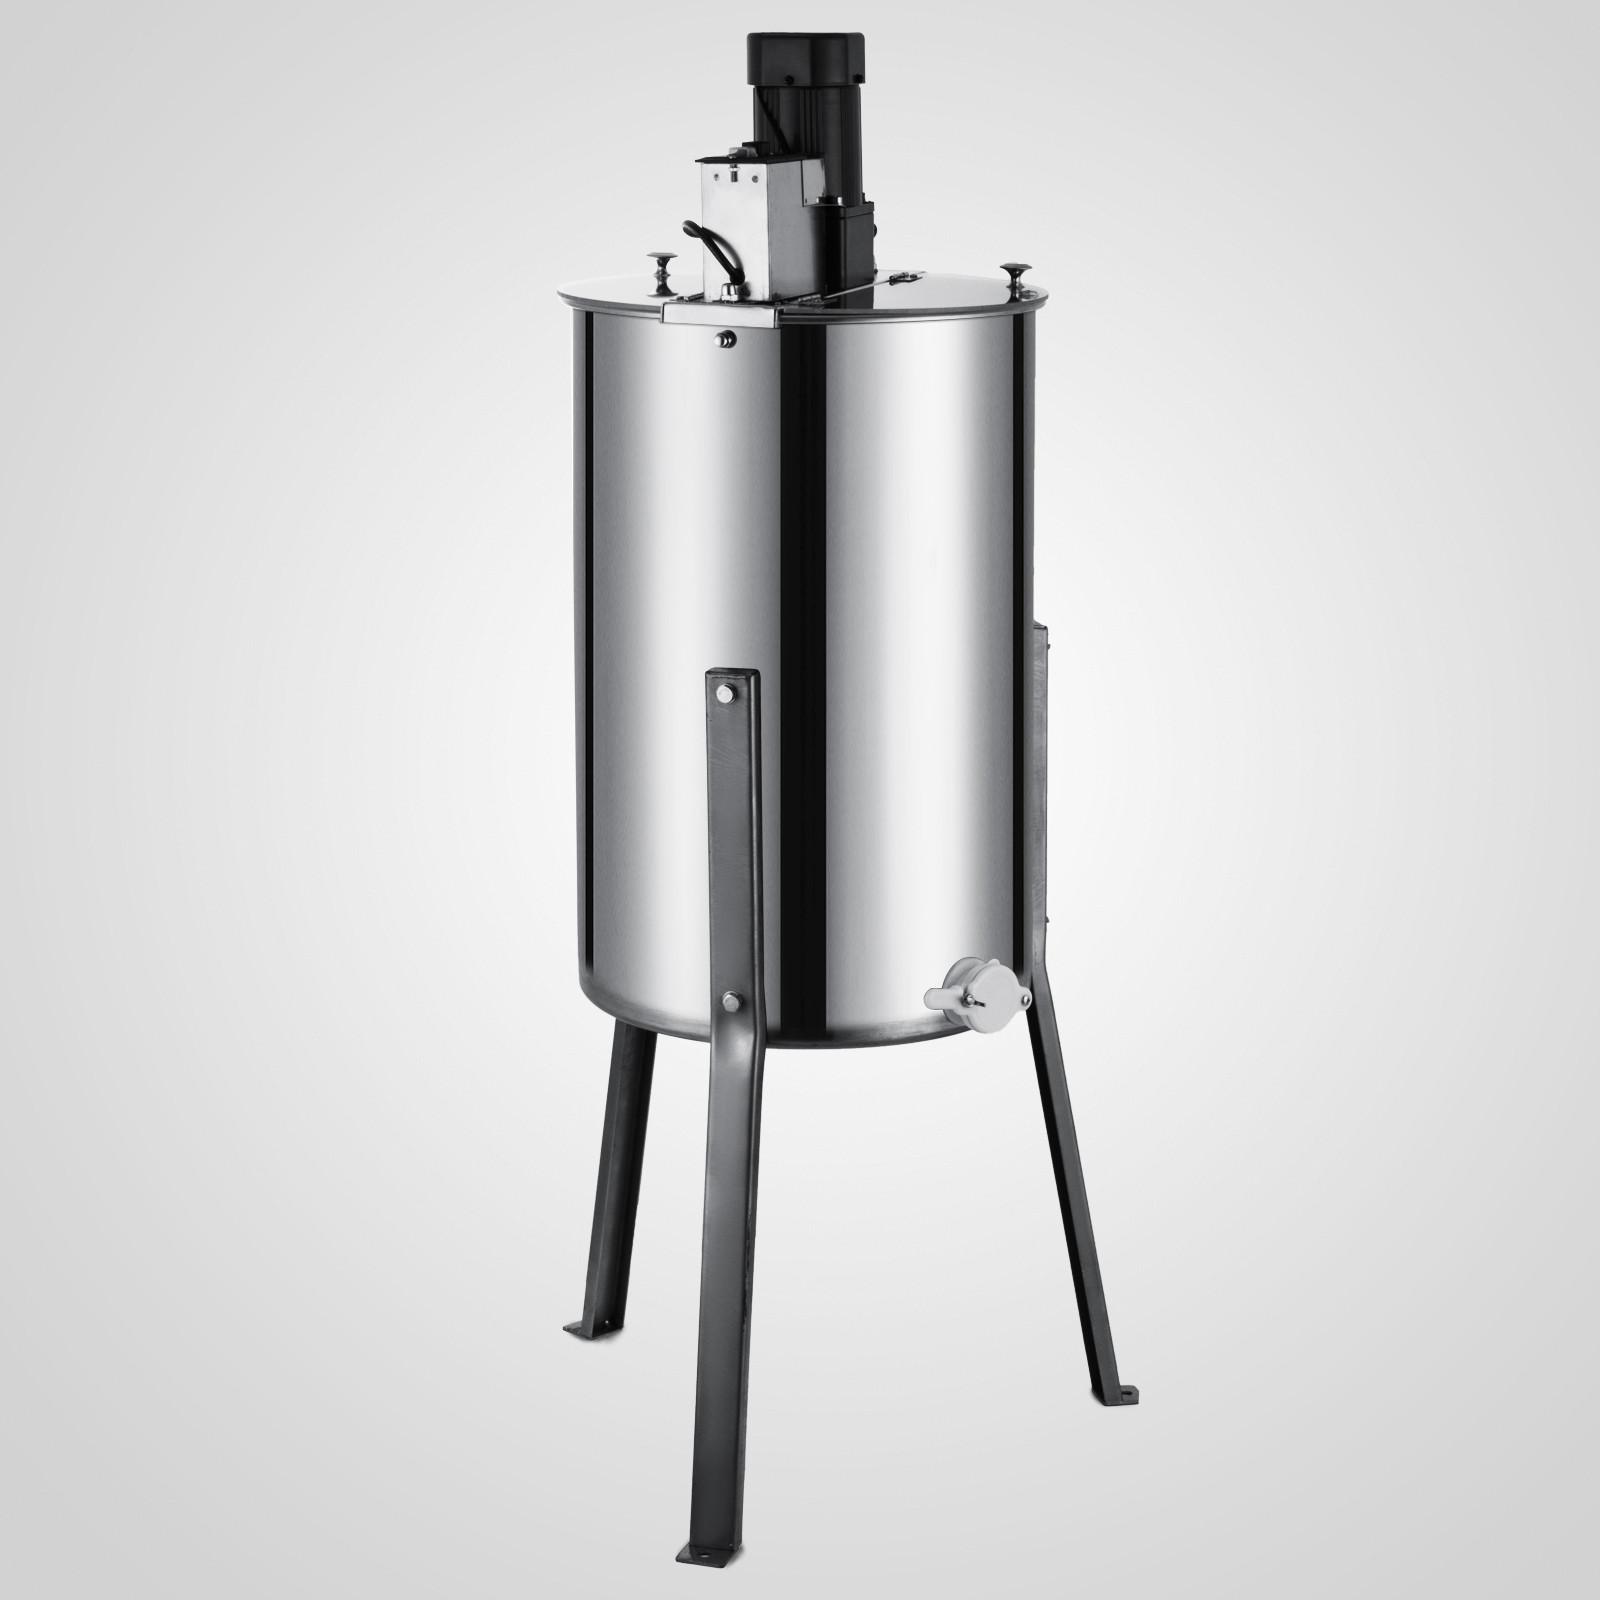 Extracteur-de-Miel-Electrique-manuelle-2-3-4-Cadres-En-Acier-Inox-Centrifugeuse miniature 42